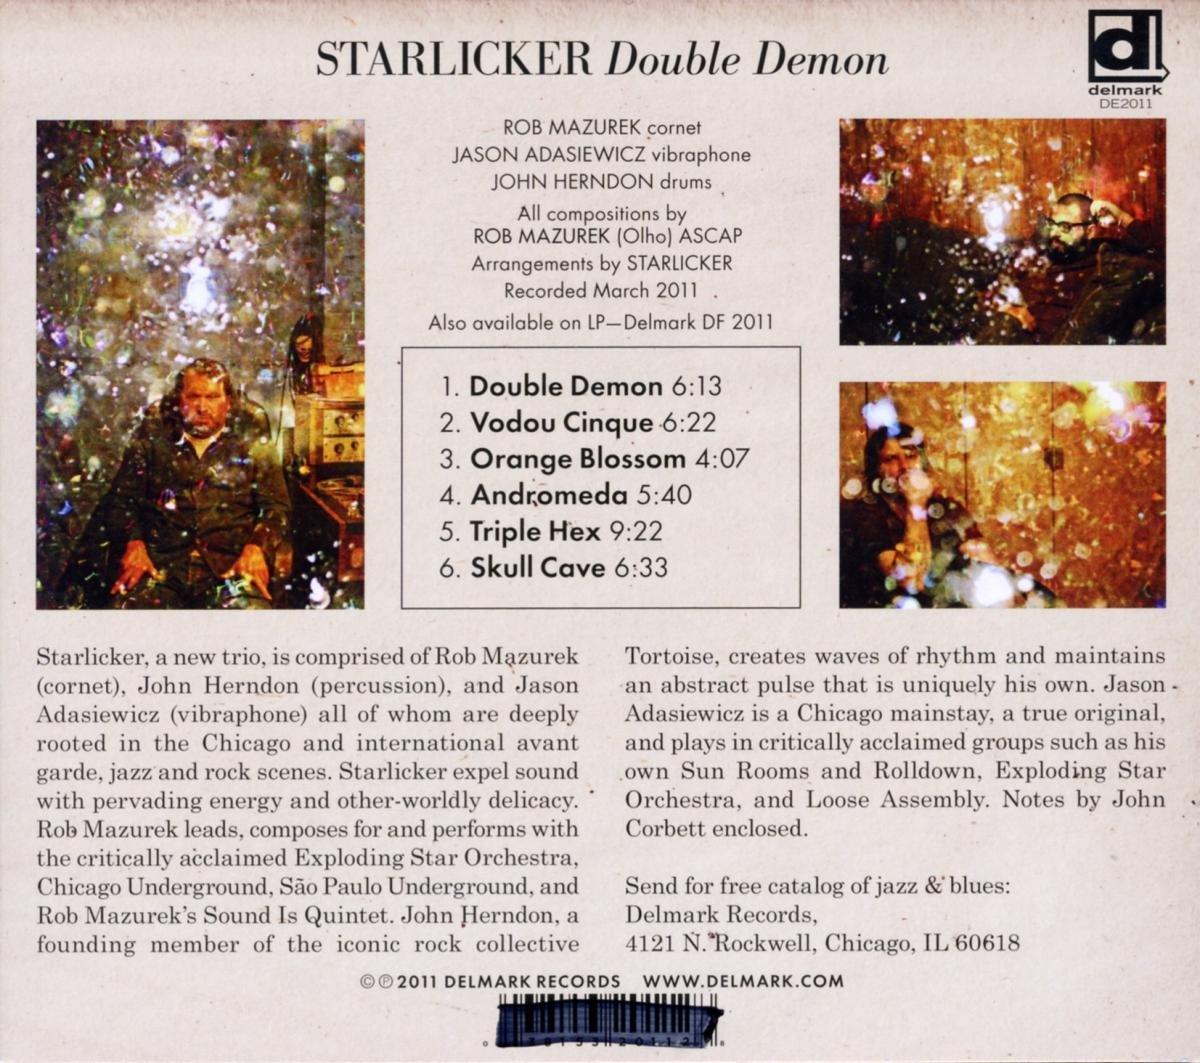 starlicker double demon